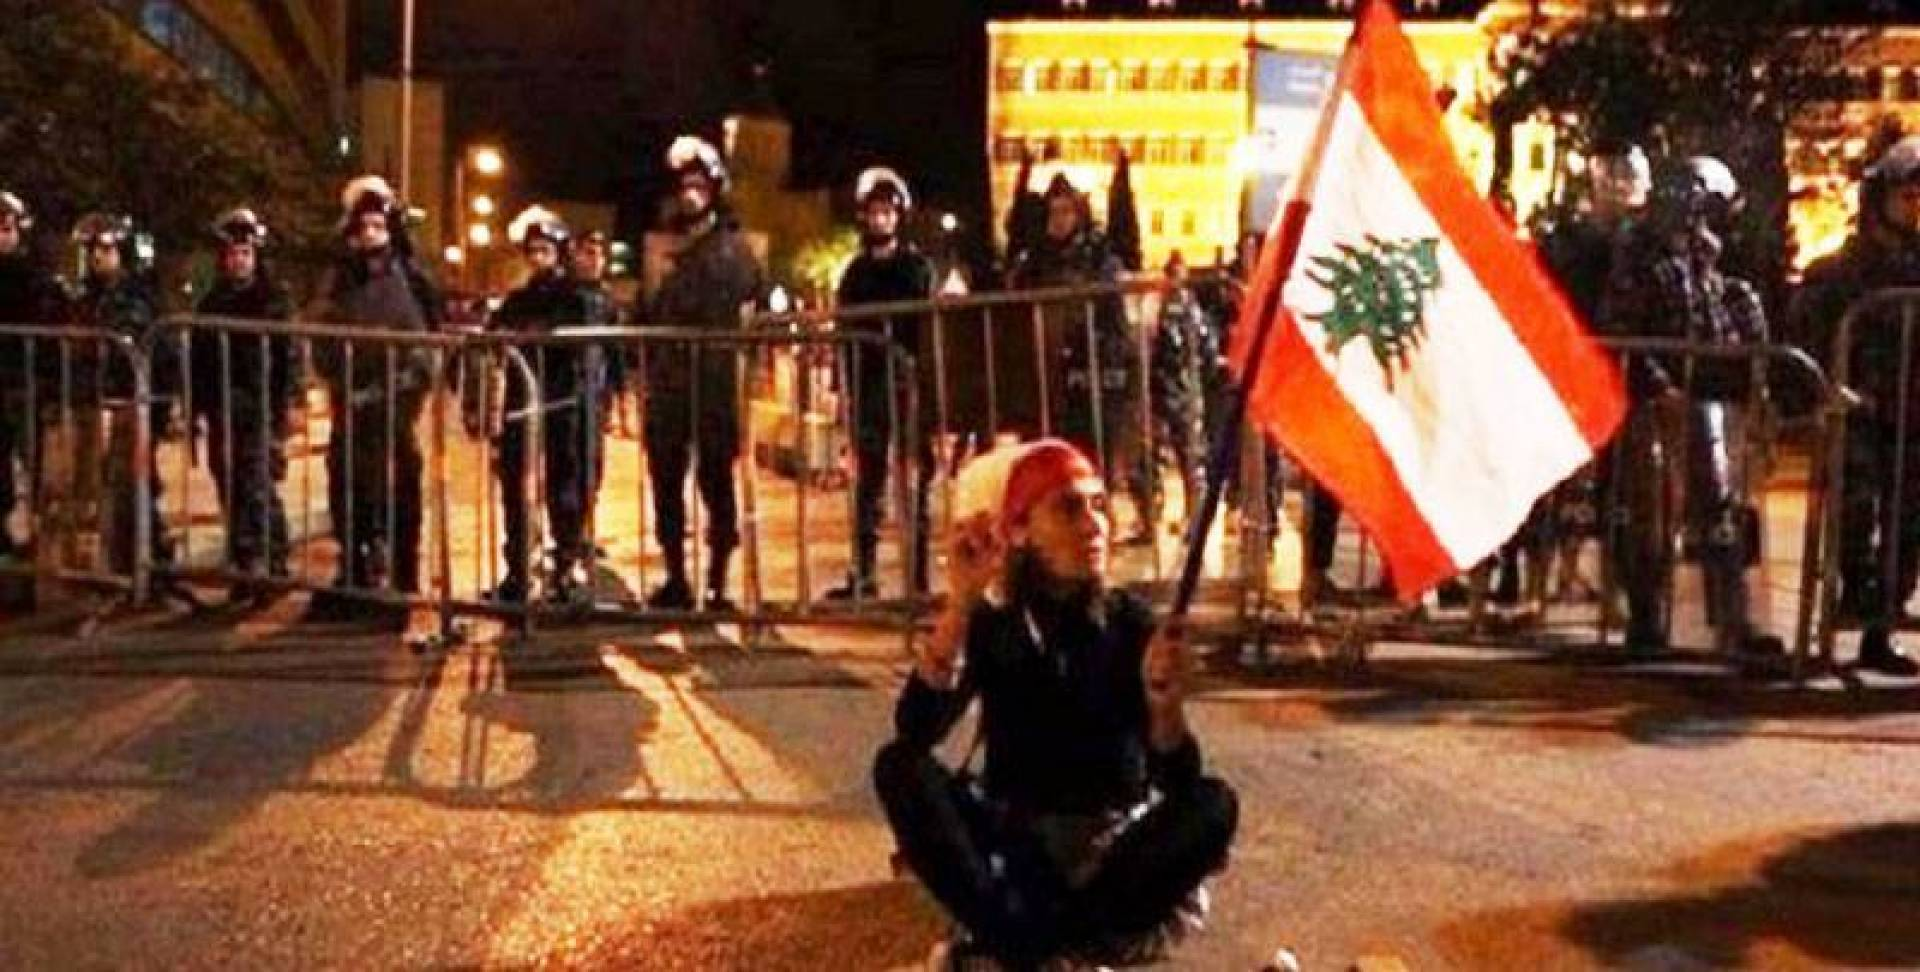 اللبنانيون يجوعون.. وحكومتهم تتخندق مع إيران